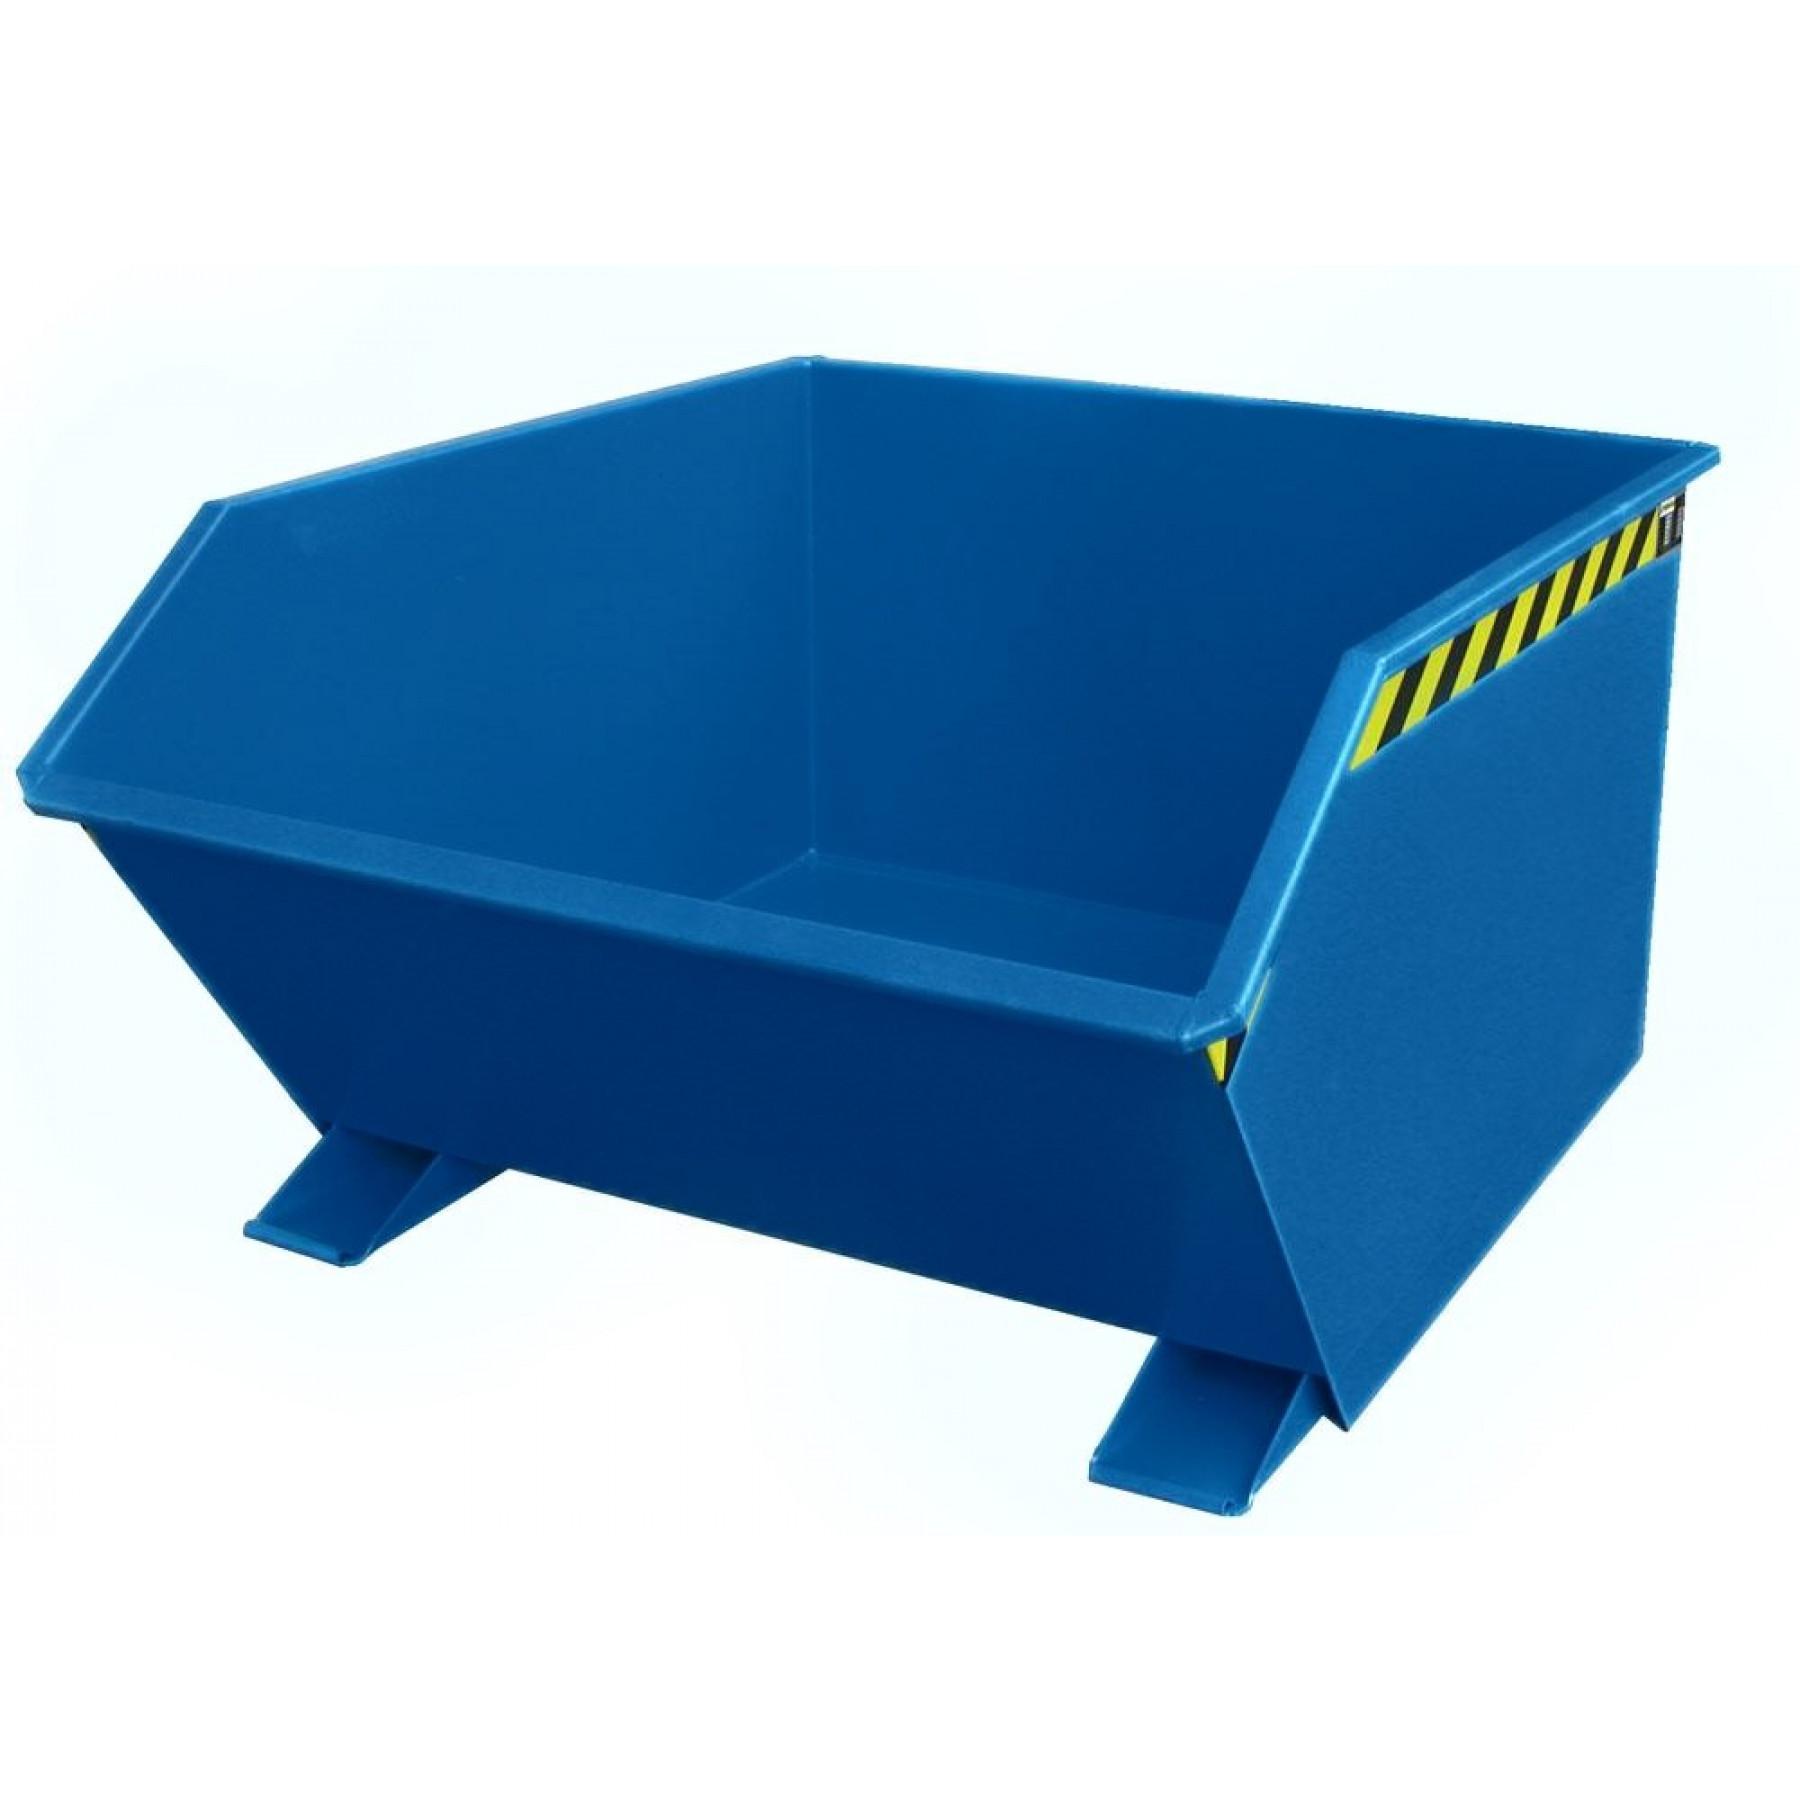 Kiepcontainer 1000 liter, laag model, MTFL-1000-5001